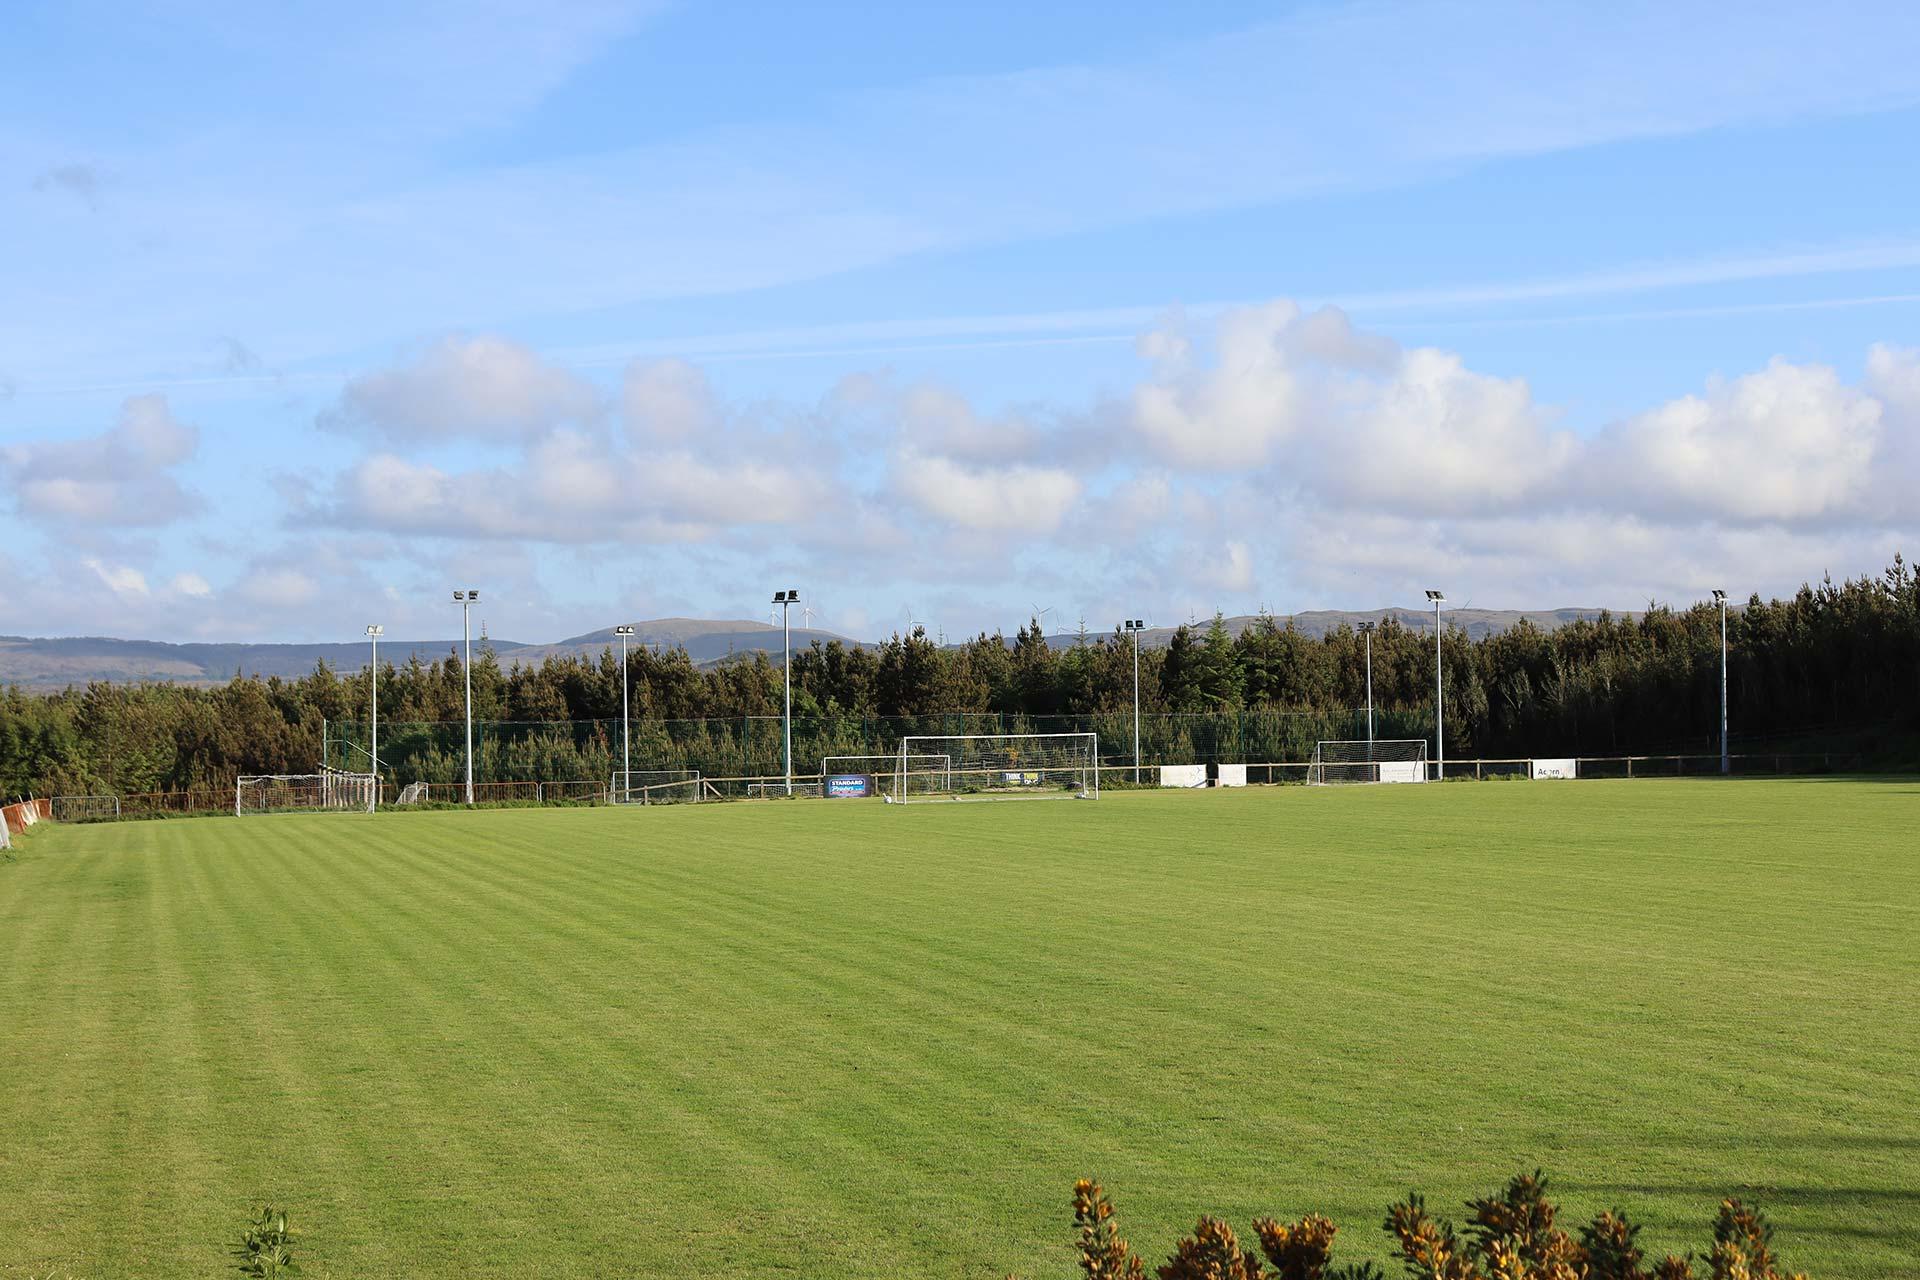 Newvillage-Football-Park-(1)